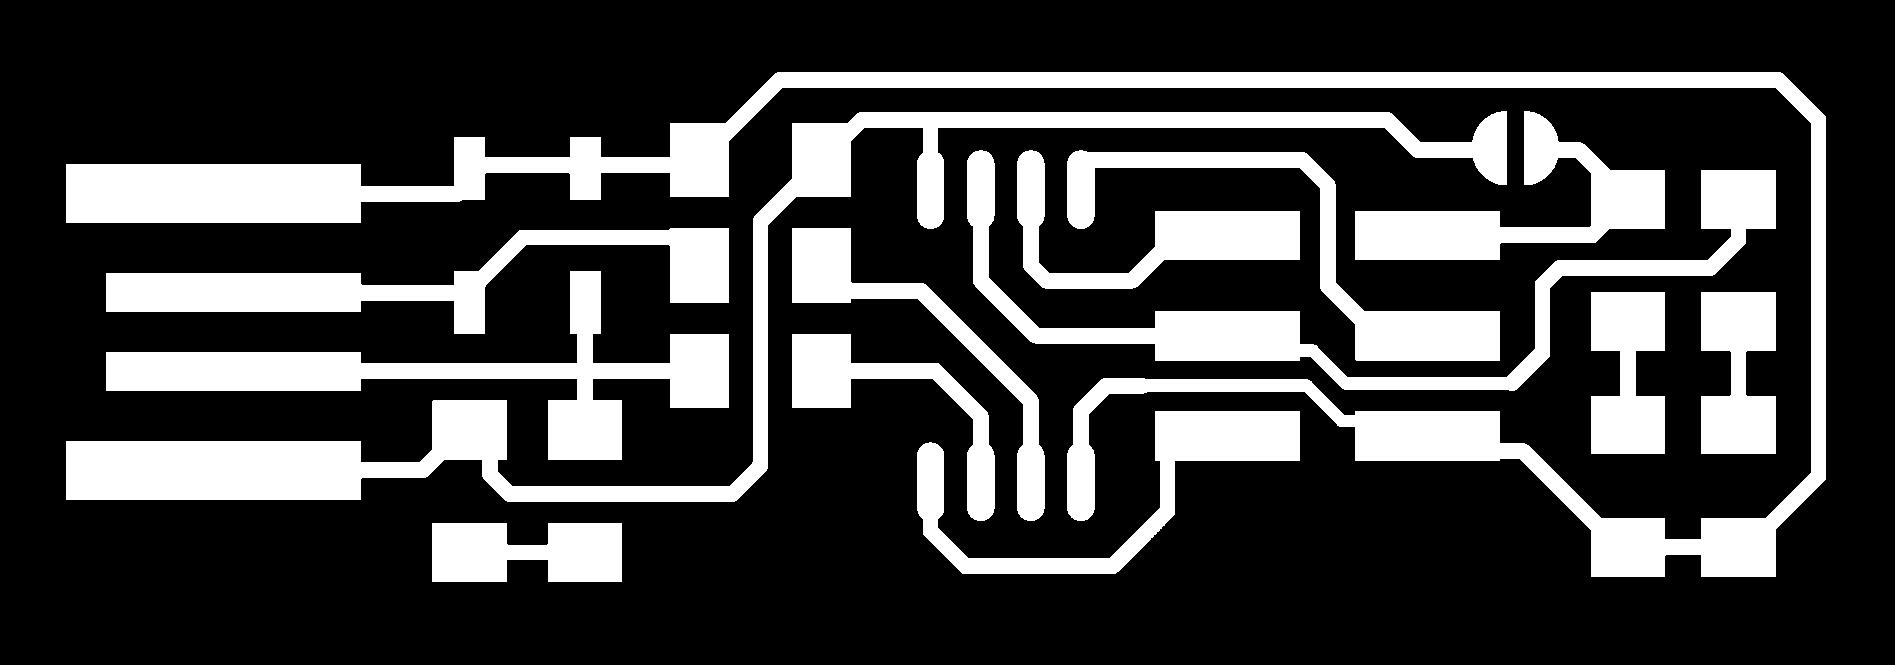 Building The Fabtinyisp Atmega Programmer Usb Pcb Component Side Traces 1000 Dpi